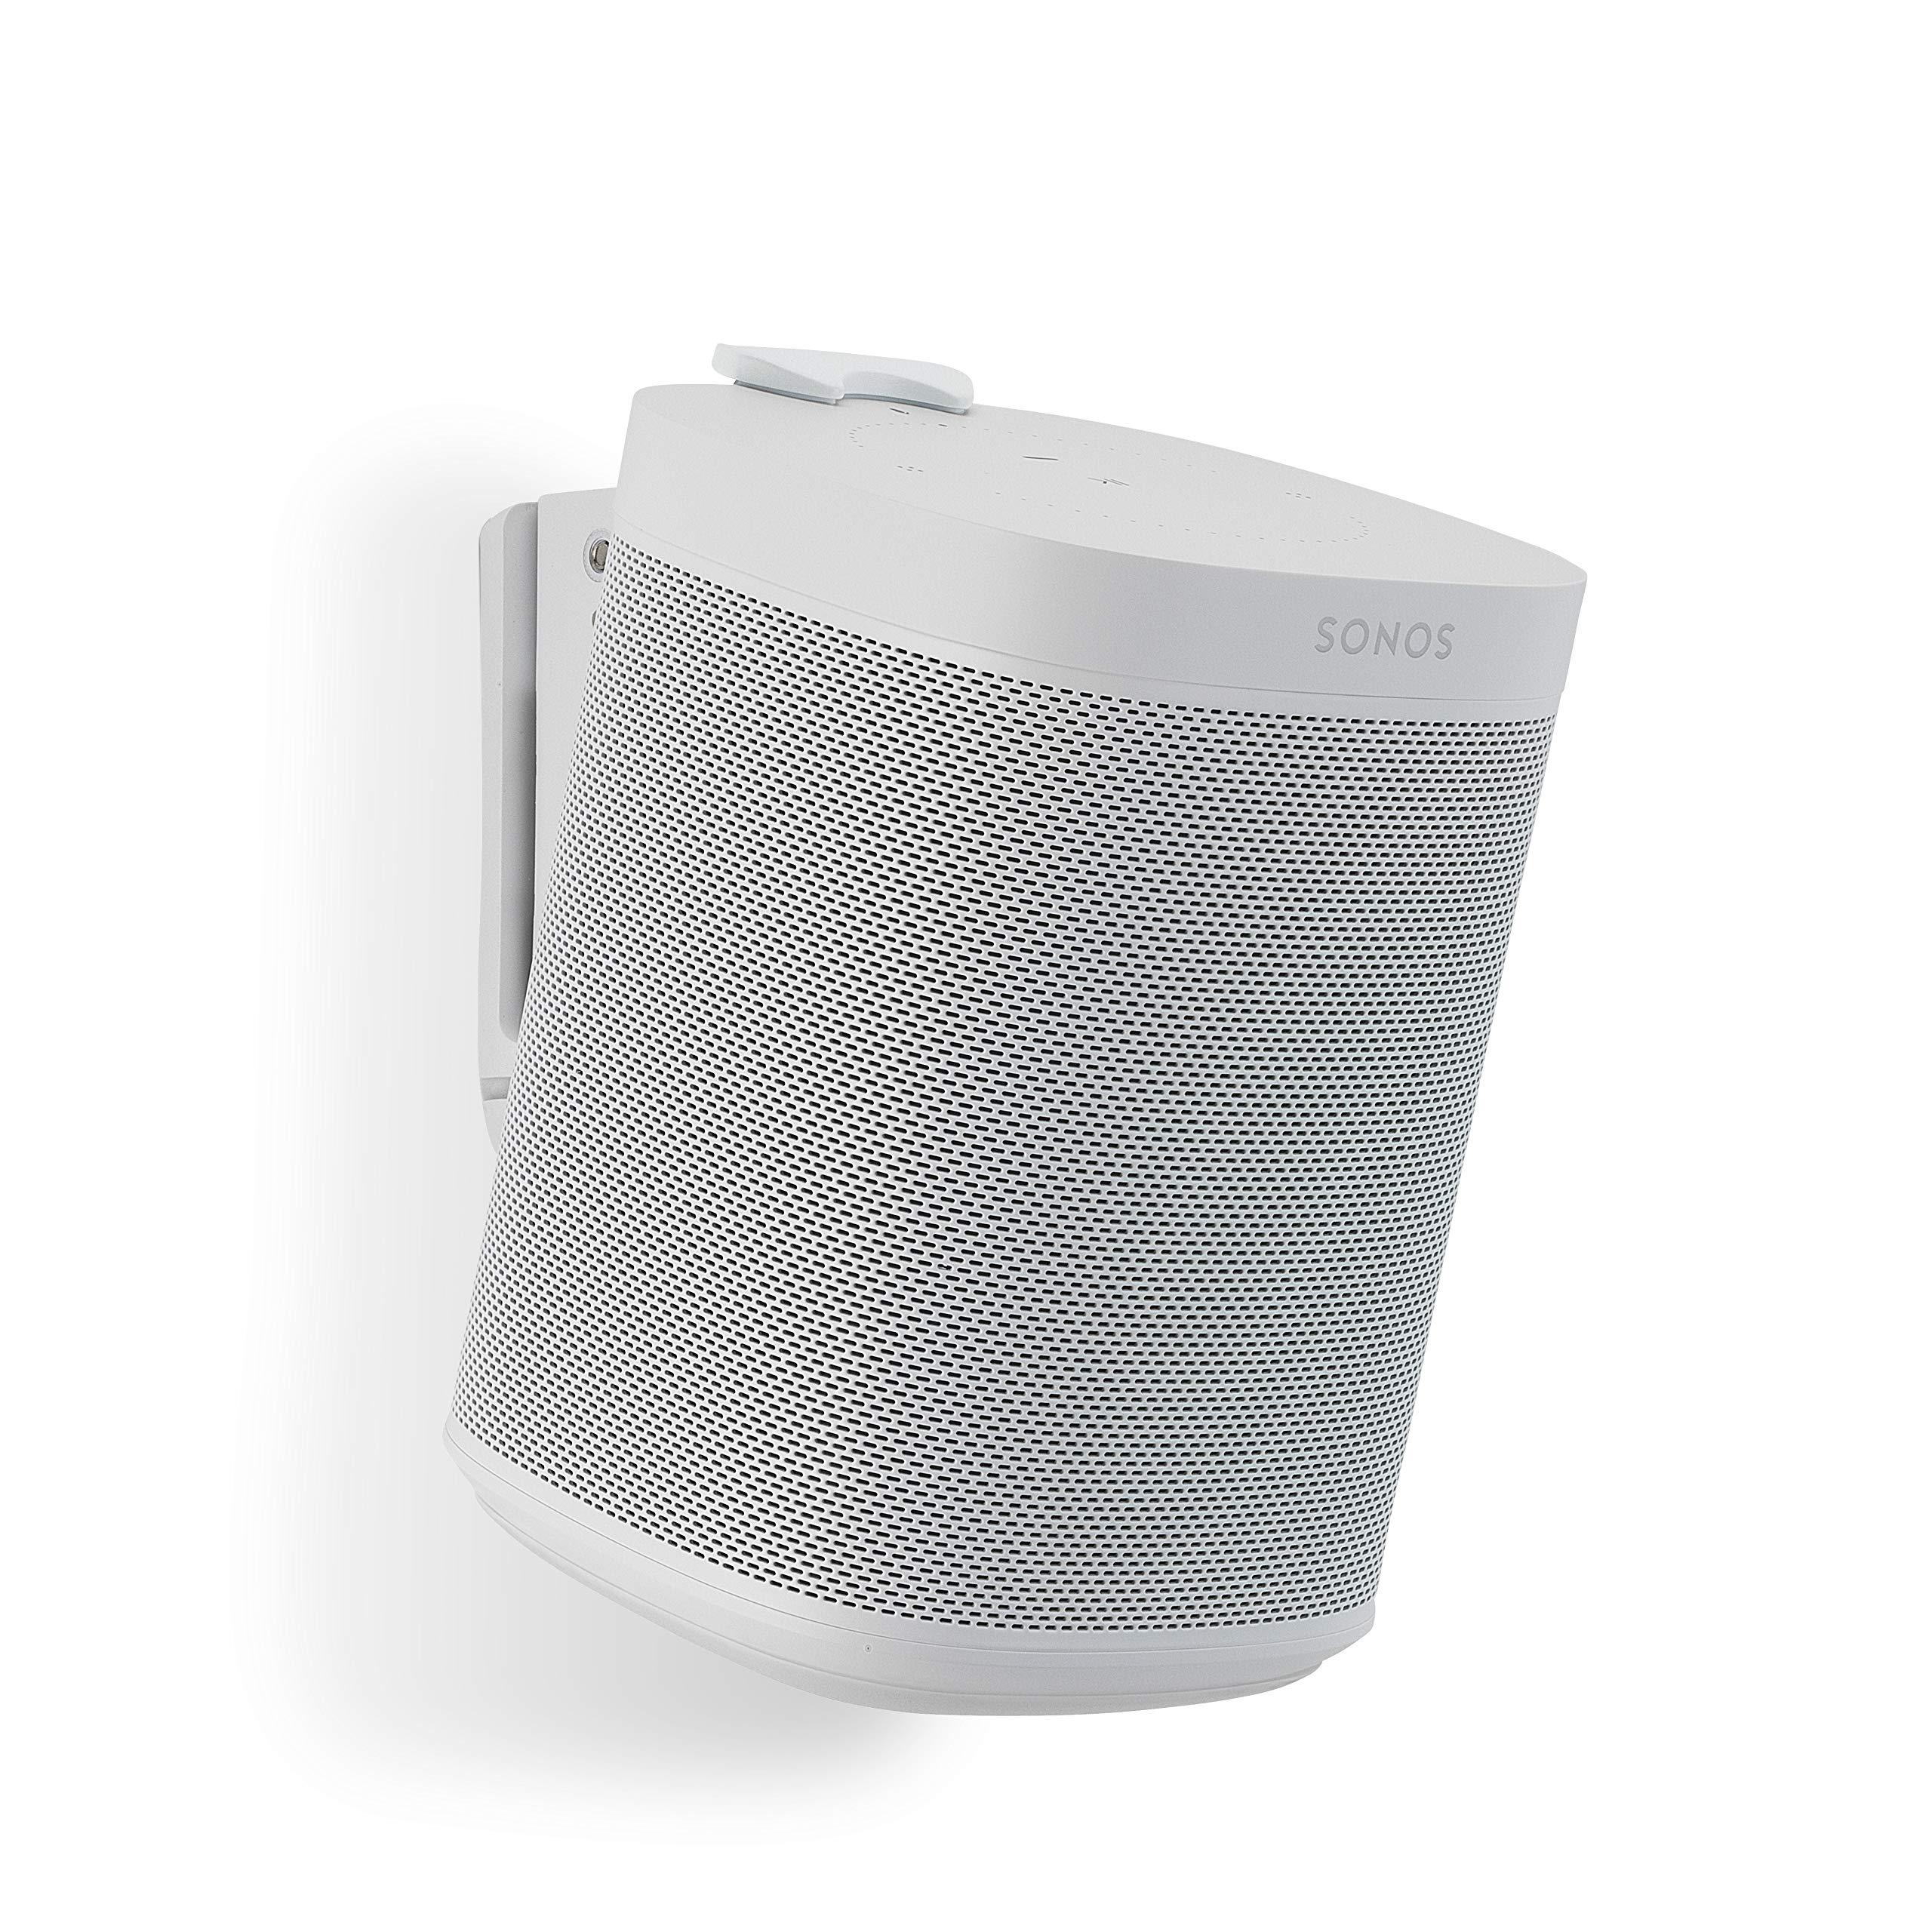 sonos speaker bracket instructions